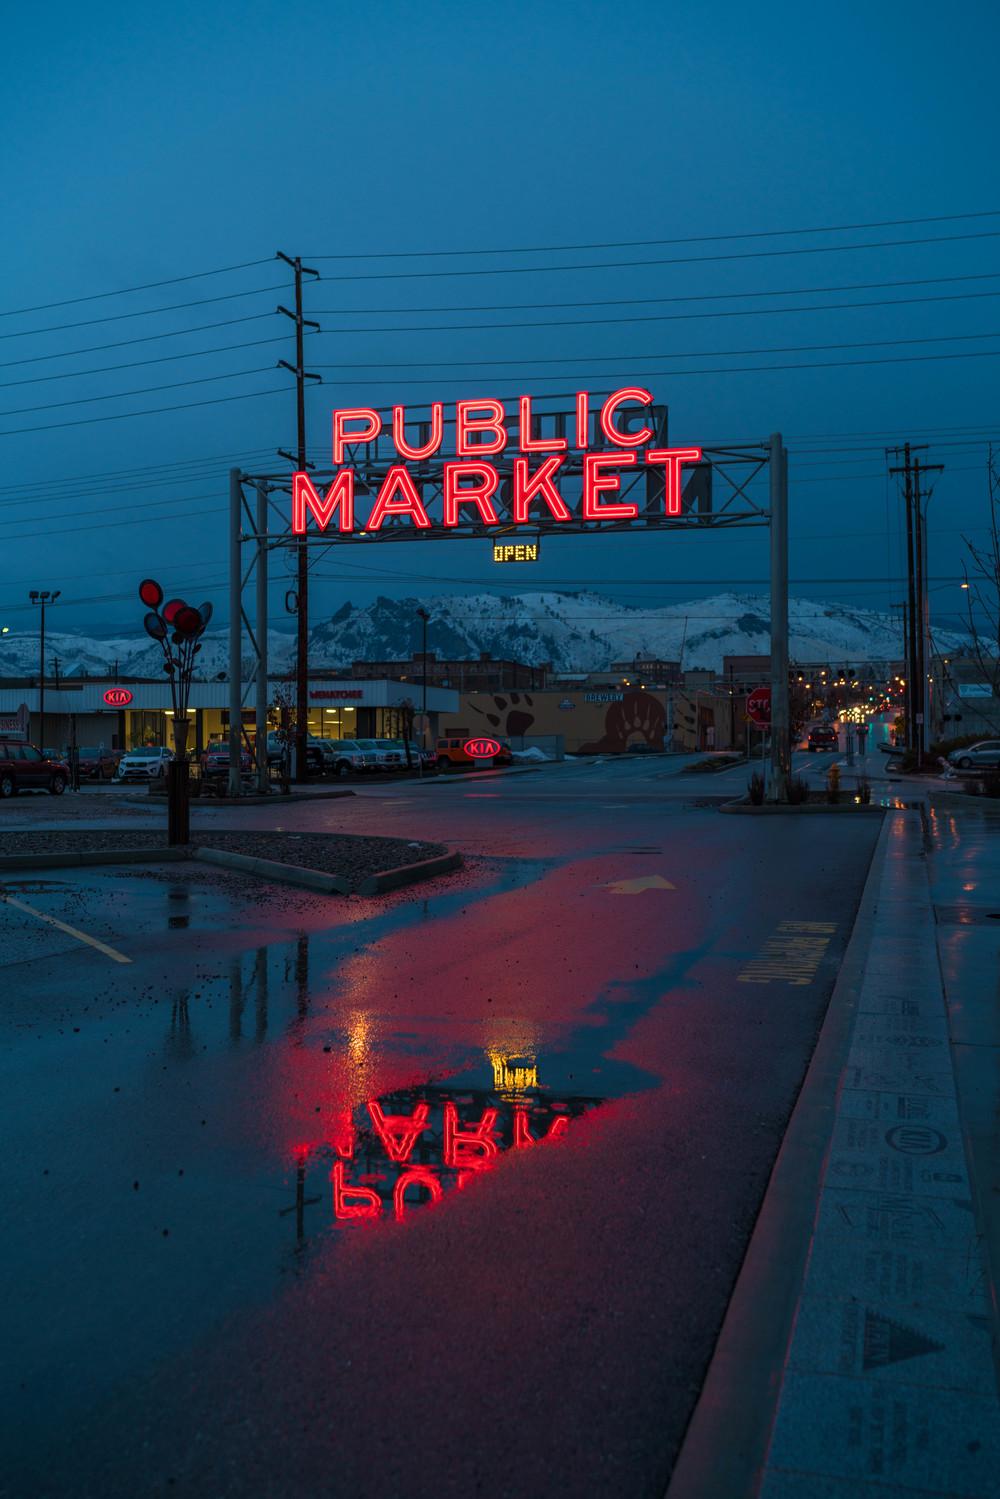 Pybus_Sign.jpg